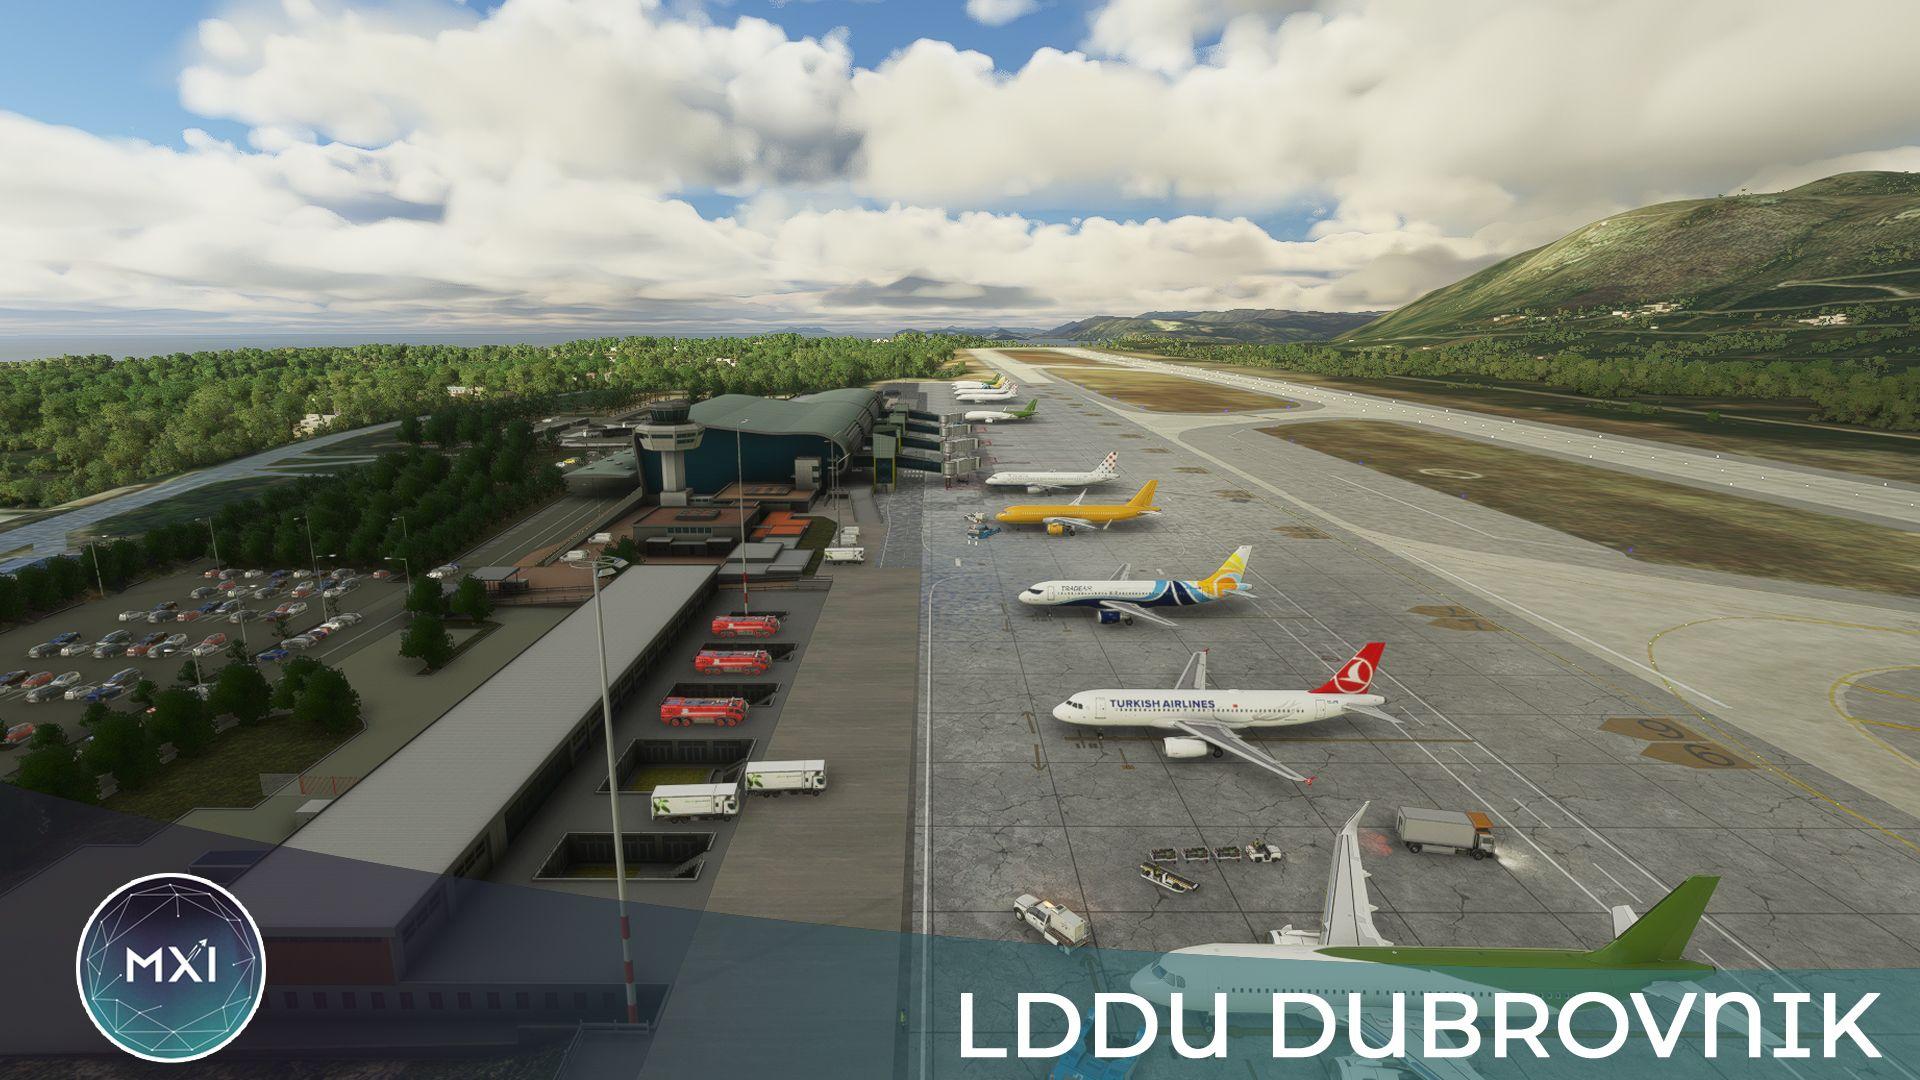 LDDU3.jpg